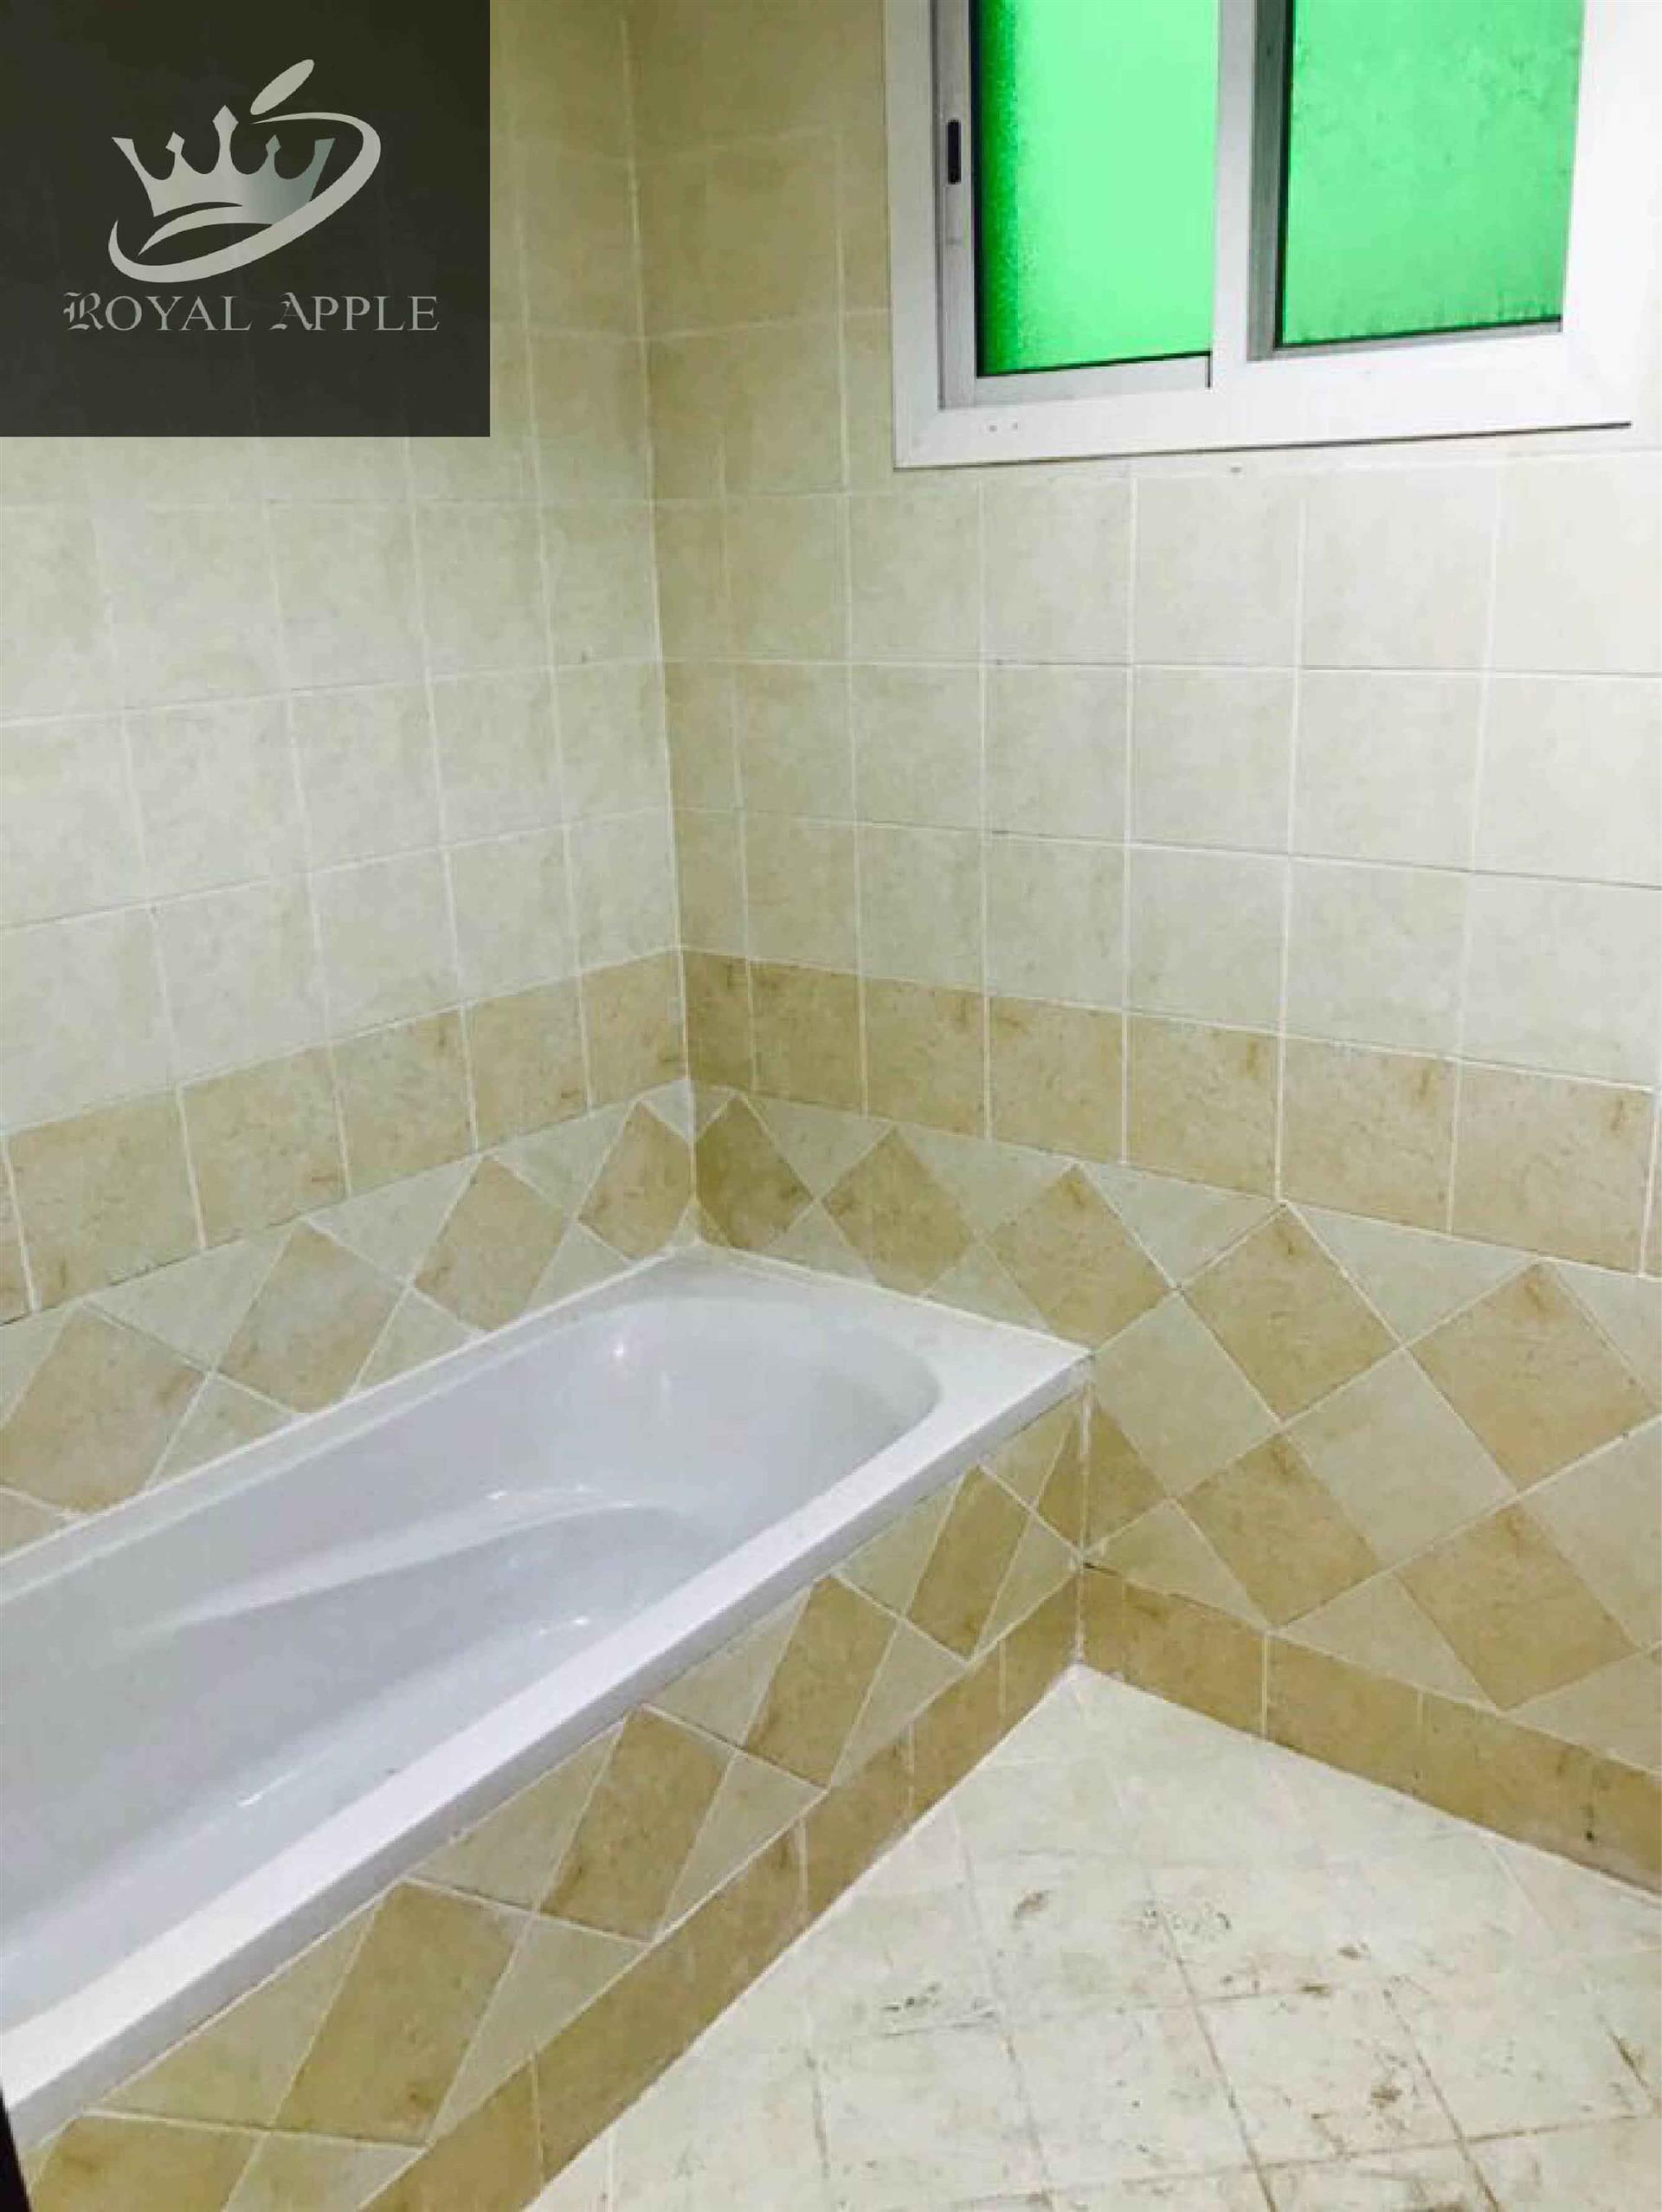 Ex-Bachelor ---Brand New 6 Bedroom 6 Bathroom Semifurnished Compound Villa in Abu Hamour Near Abu Hamour Petro Station